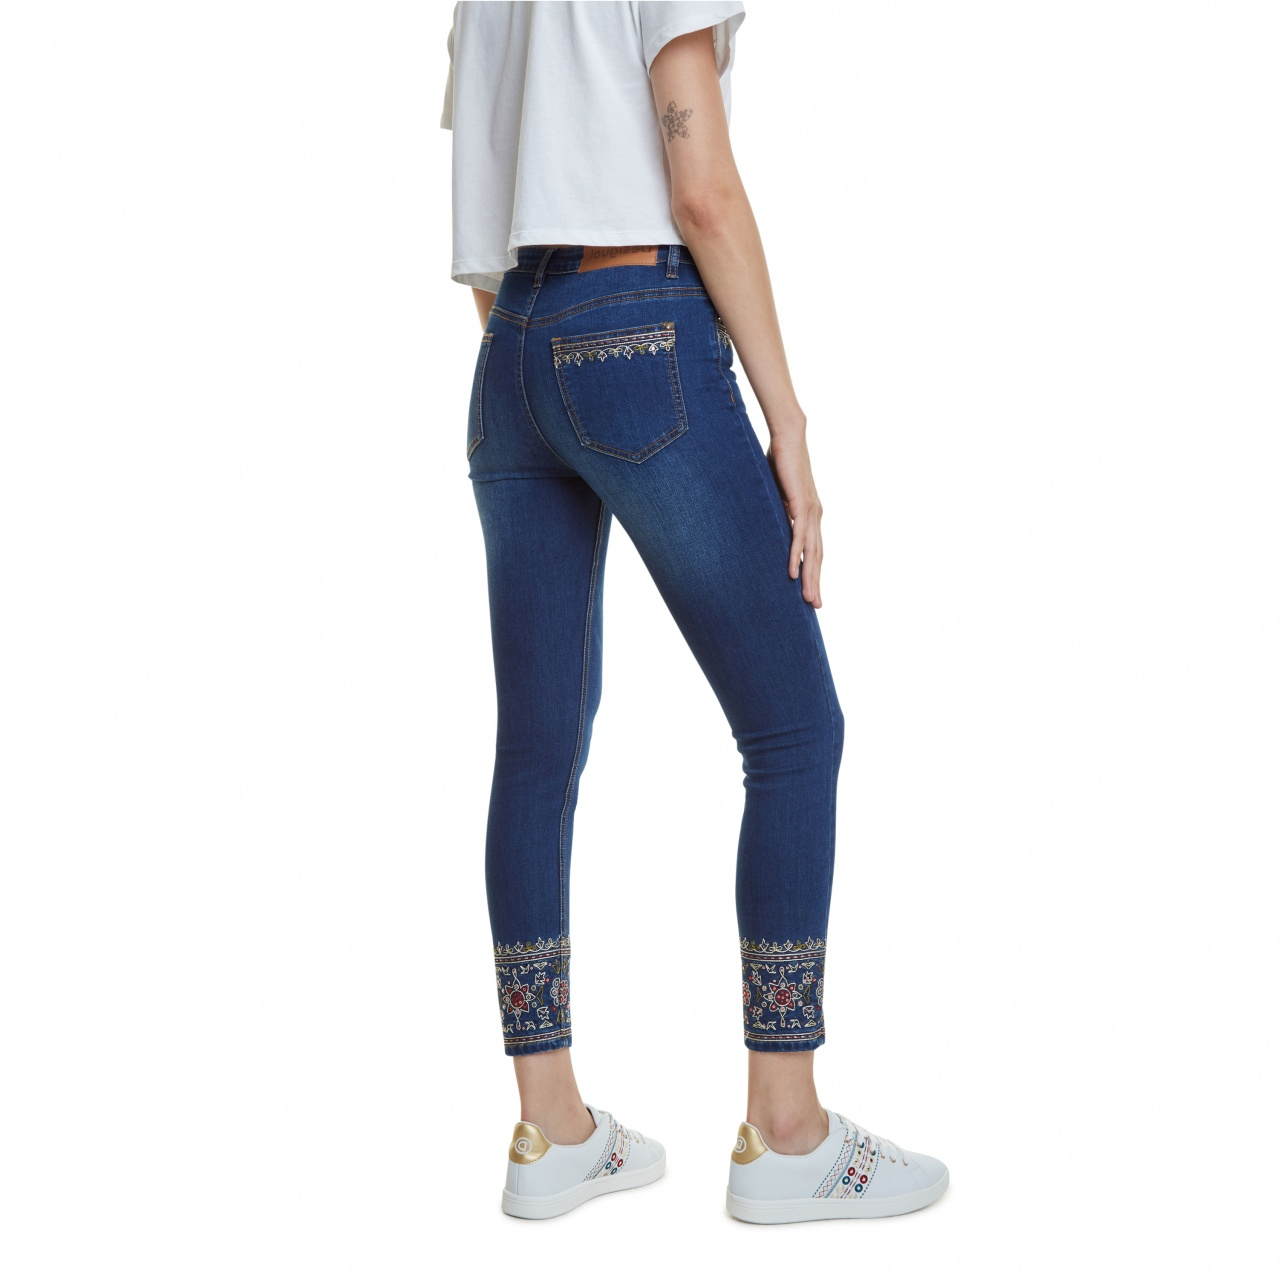 Pantaloni Desigual Denim Floyer :: 34